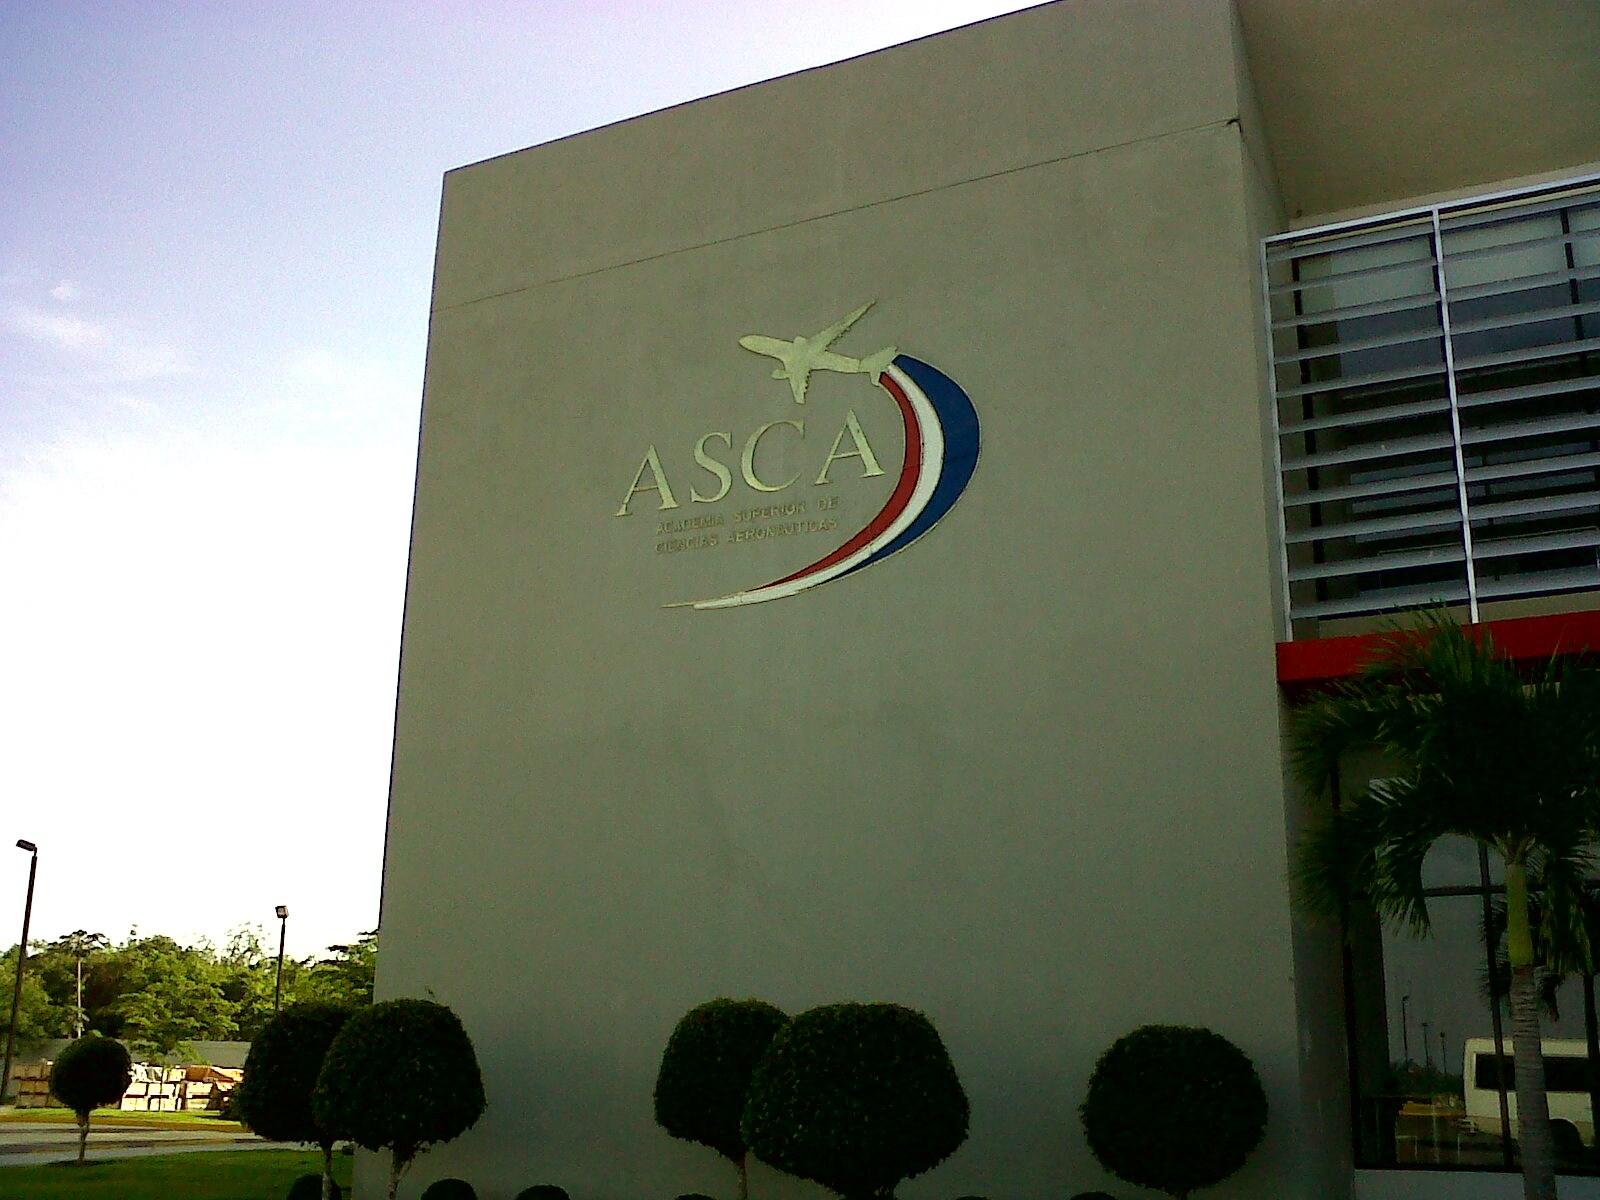 Academia de Ciencias Aeronáuticas gradua 13 estudiantes haitianos